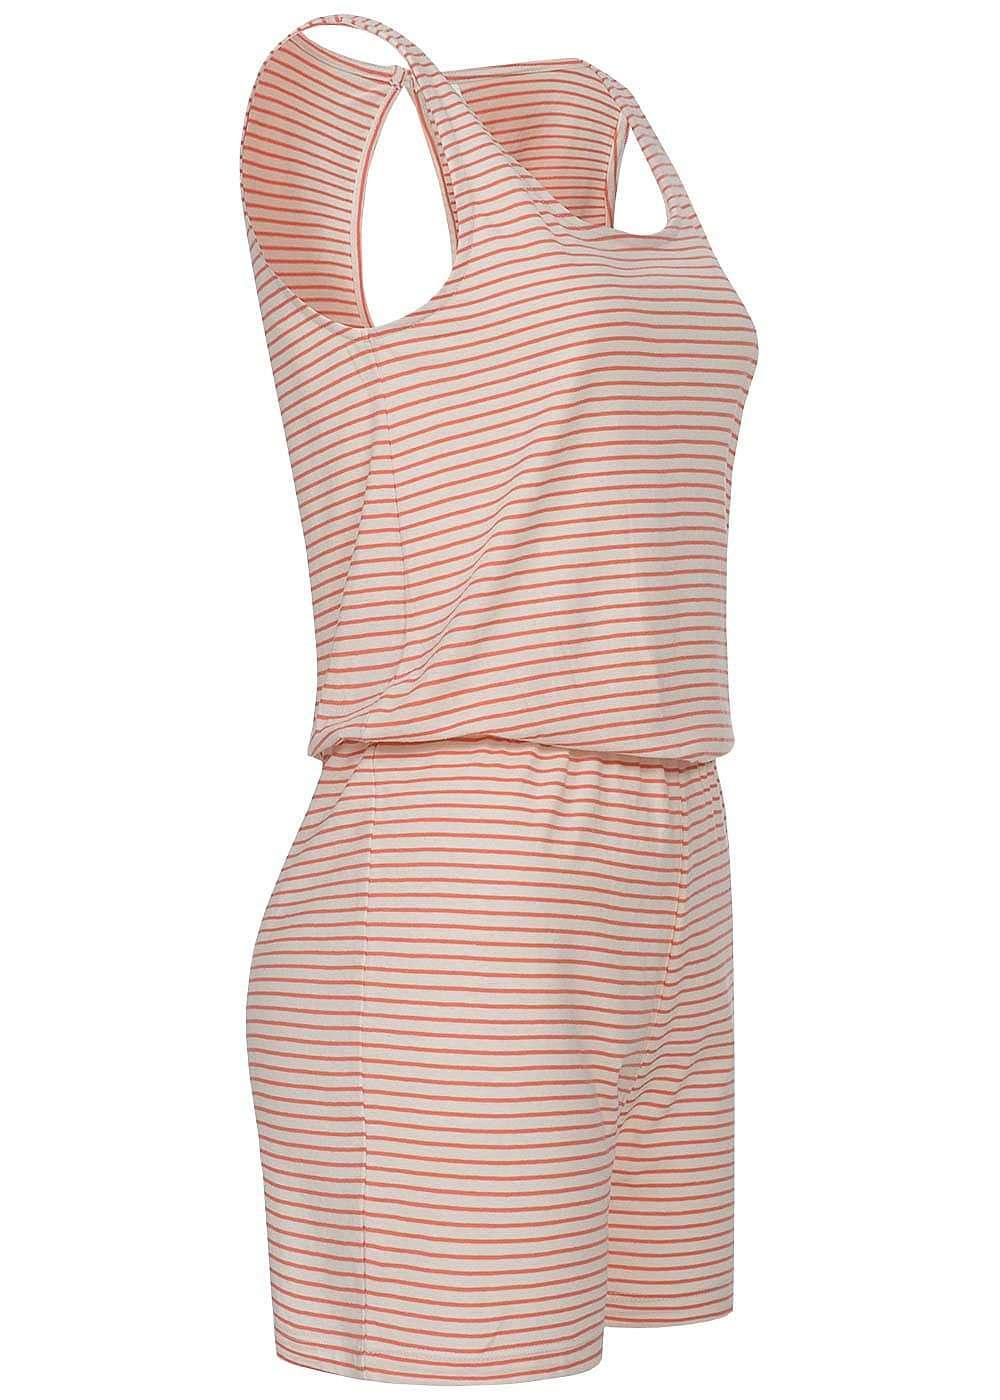 only damen jumpsuit gestreift gummizug r ckenausschnitt coral pink whisper weiss 77onlineshop. Black Bedroom Furniture Sets. Home Design Ideas